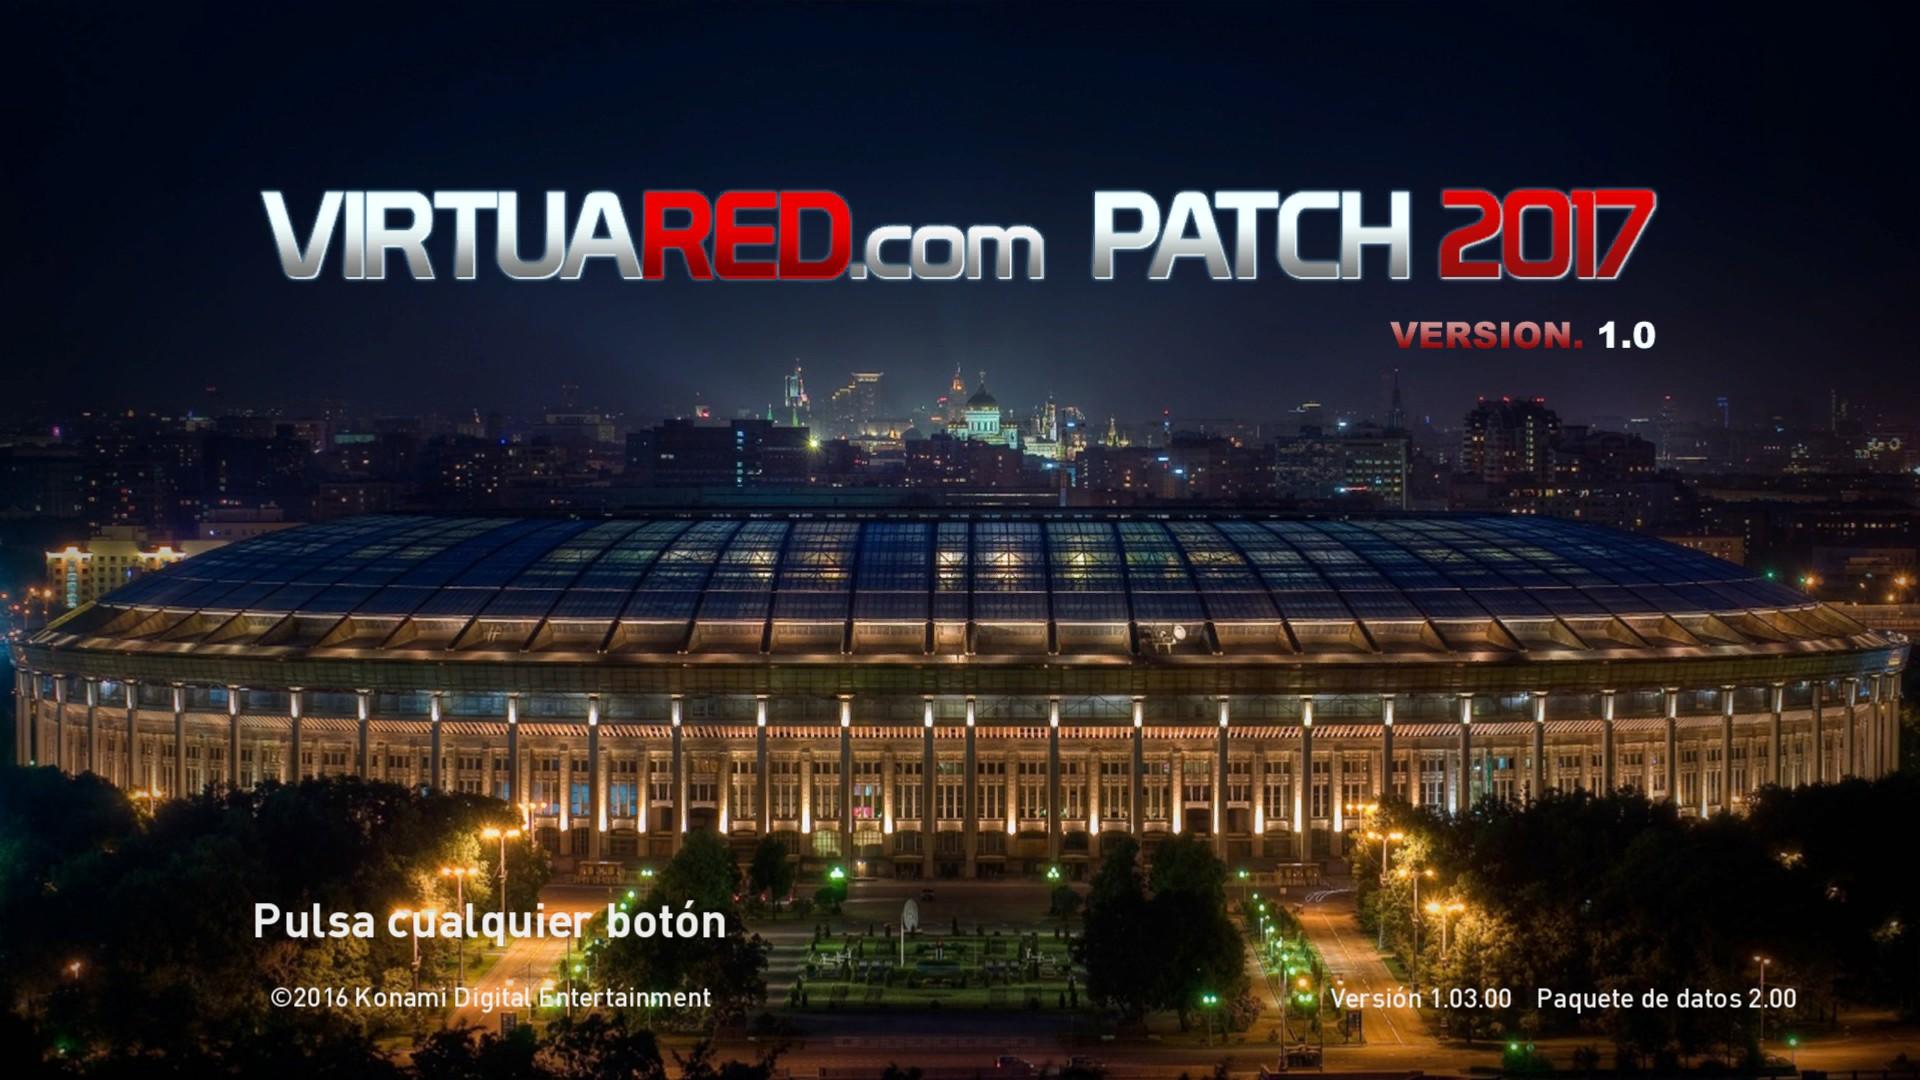 VirtuaRED.com Patch 2017 v1 ¡ya disponible!